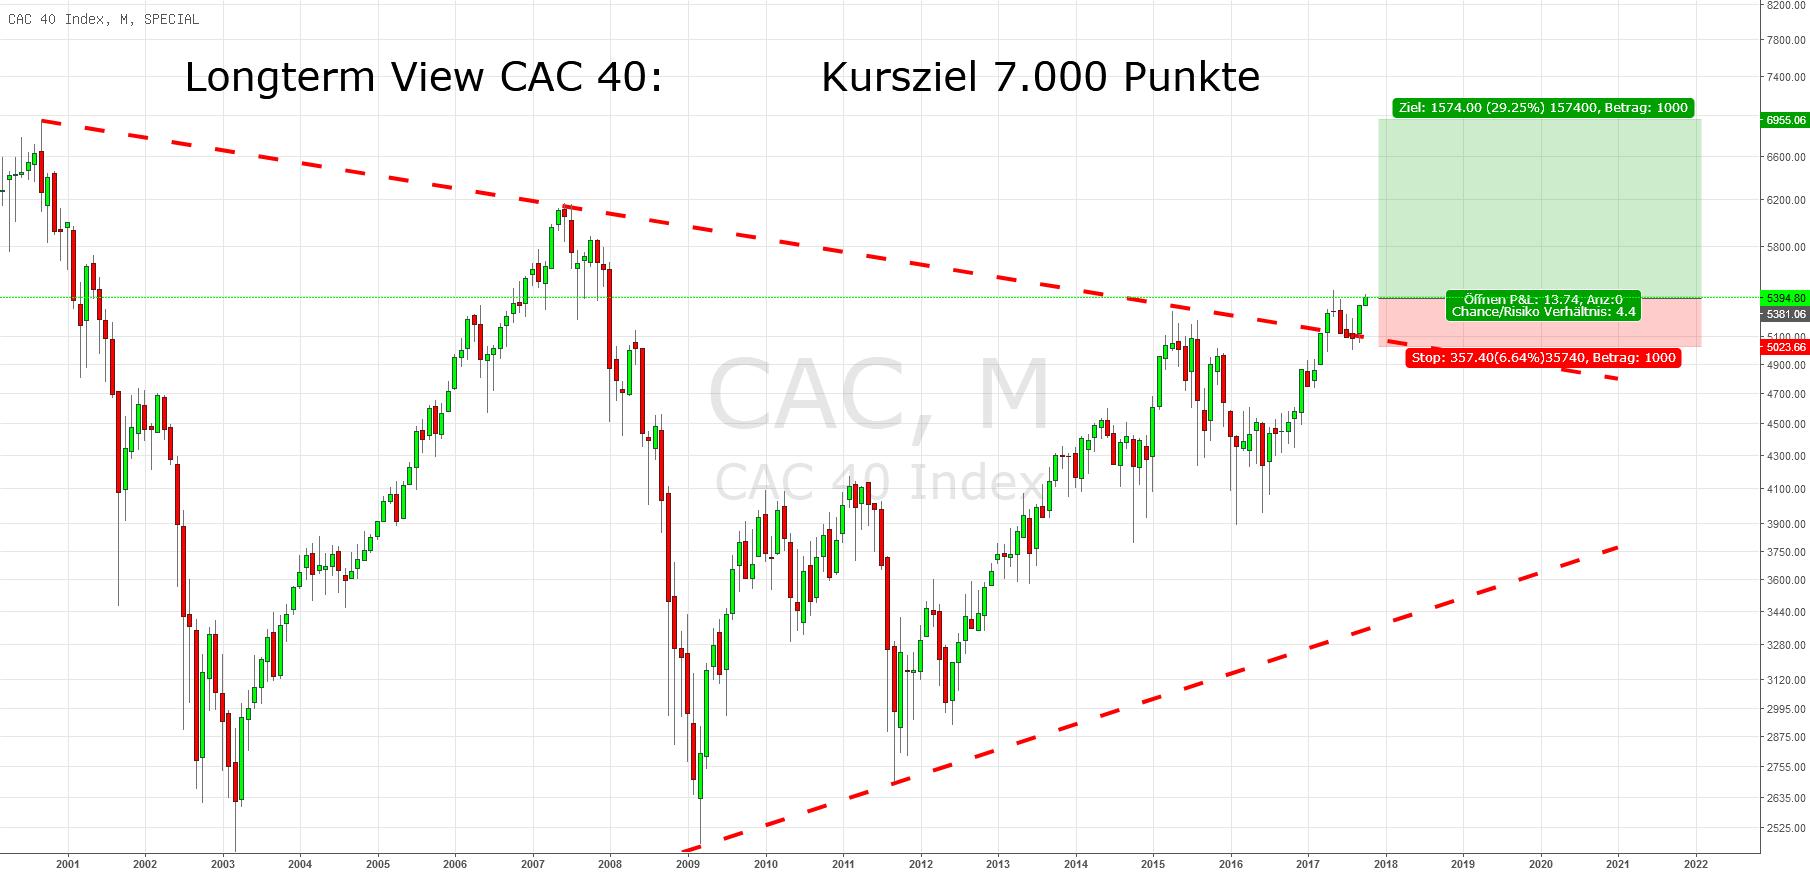 CAC 40 Longterm View: Kursziel 7.000 Punkte